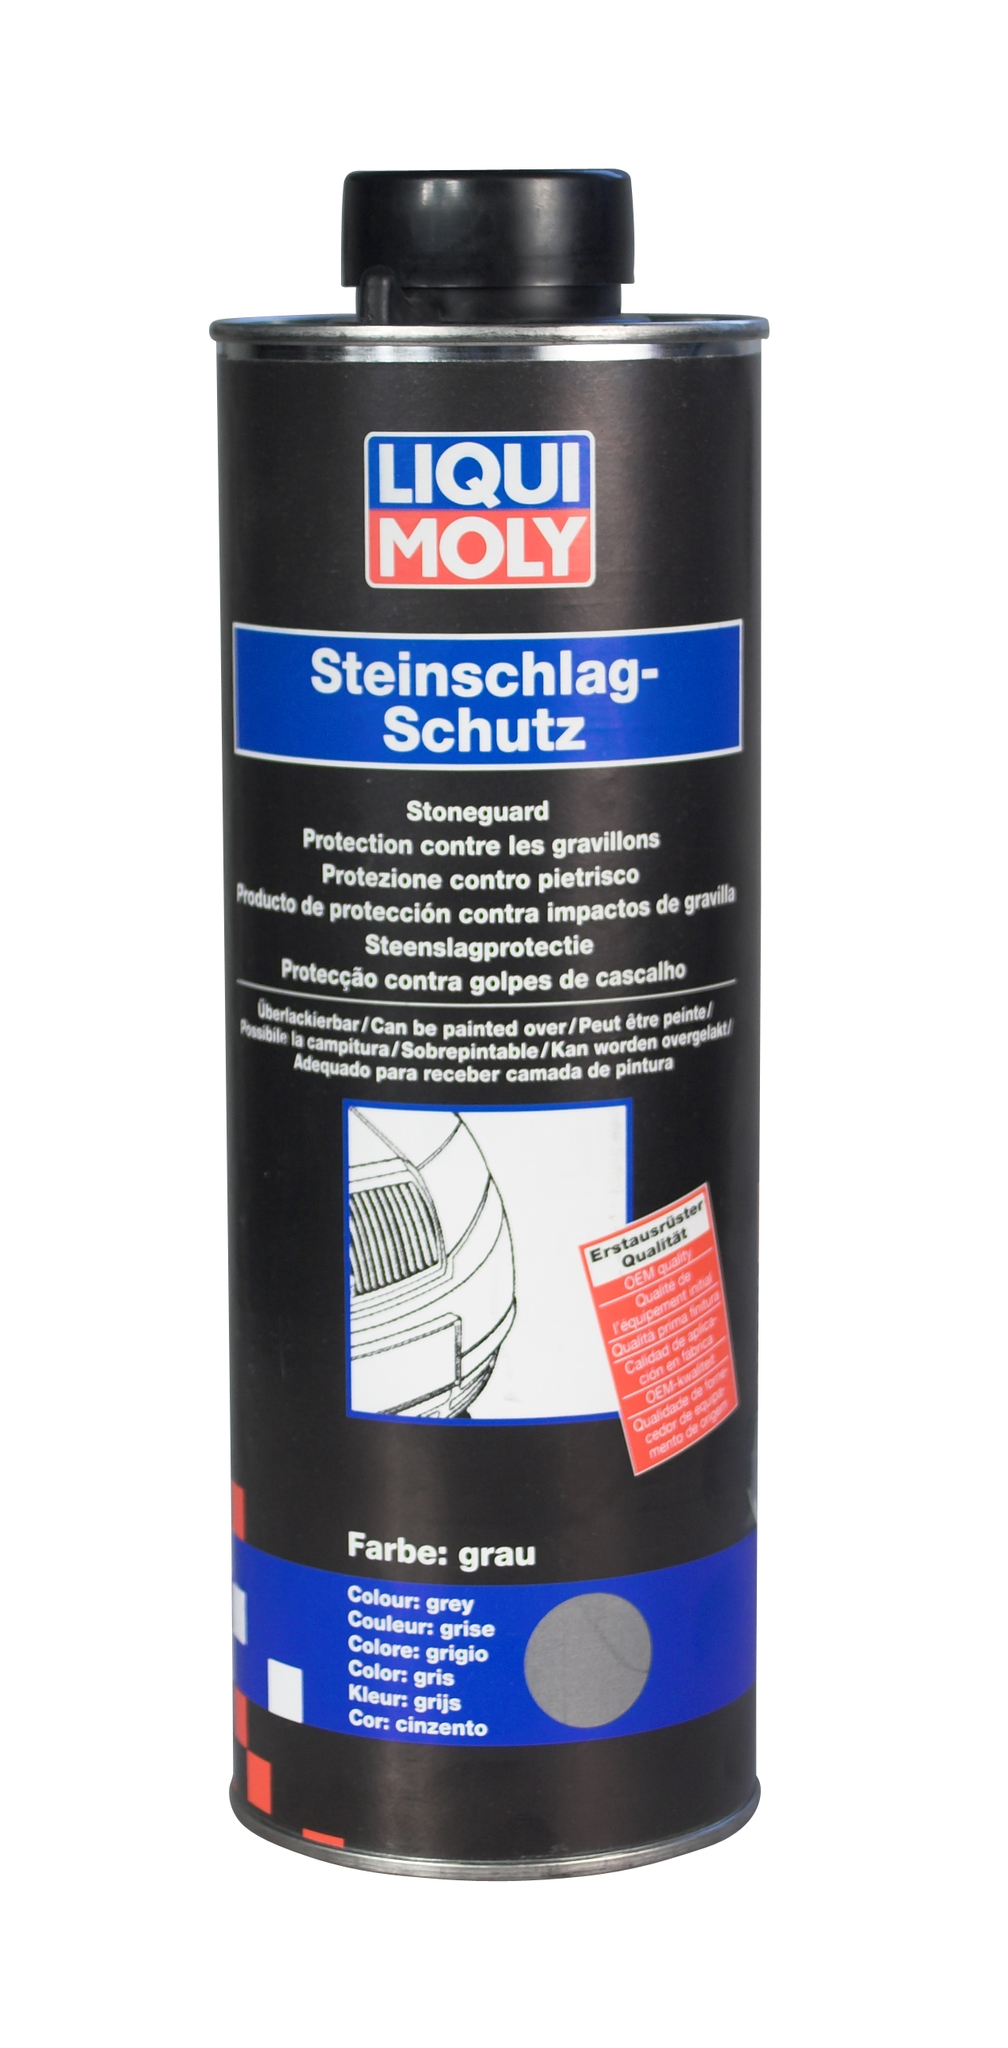 Liqui Moly Steinschlag-Schutz grau Антигравий